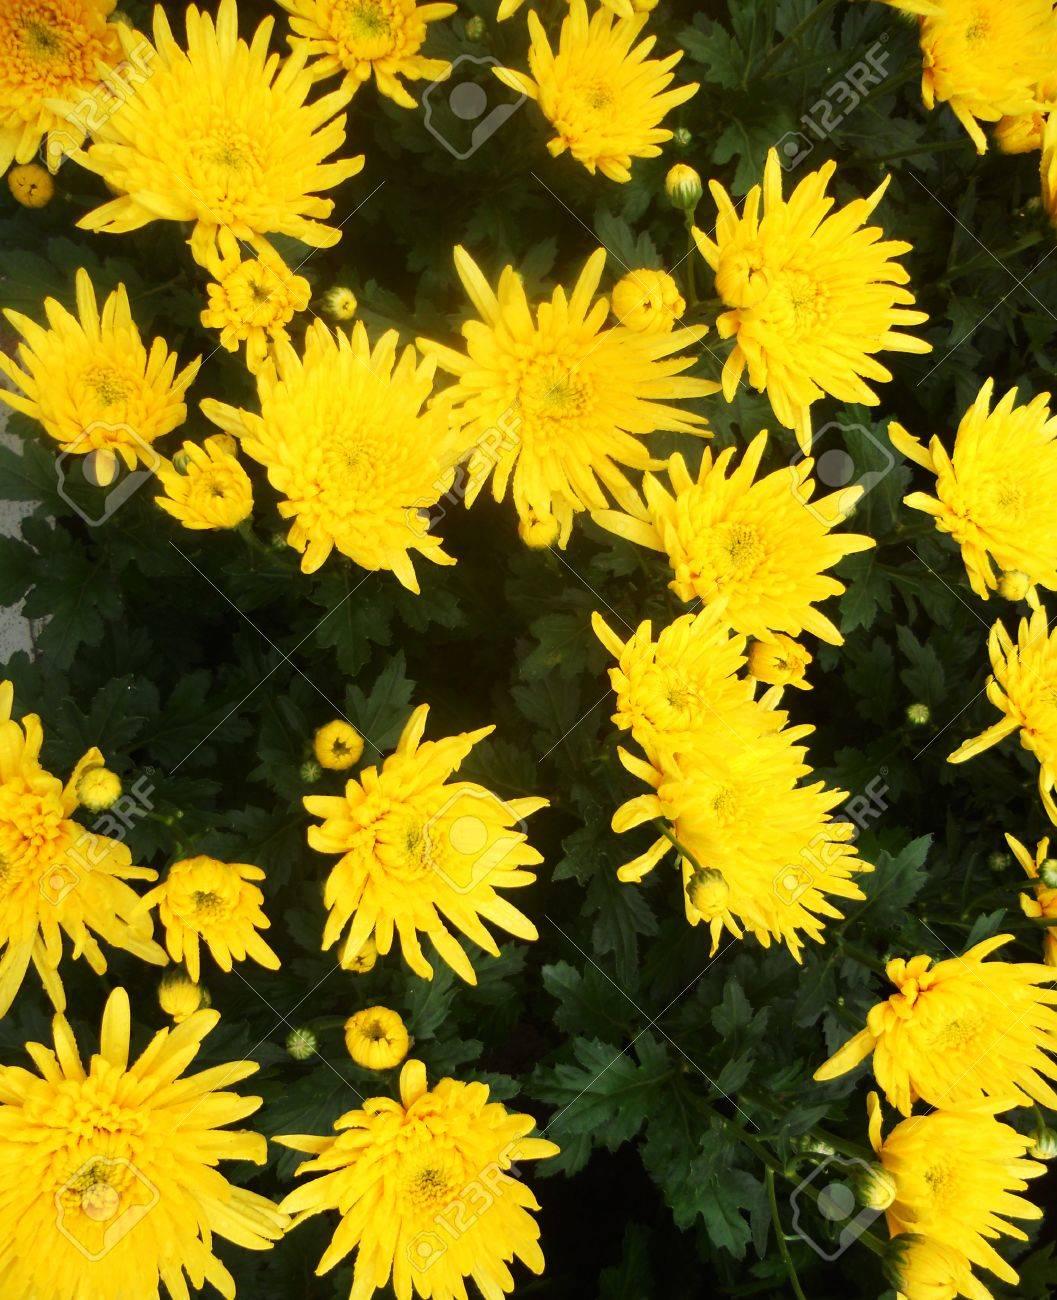 Yellow Flowers Bright Yellow Daisy Type Flowers With Dark Green